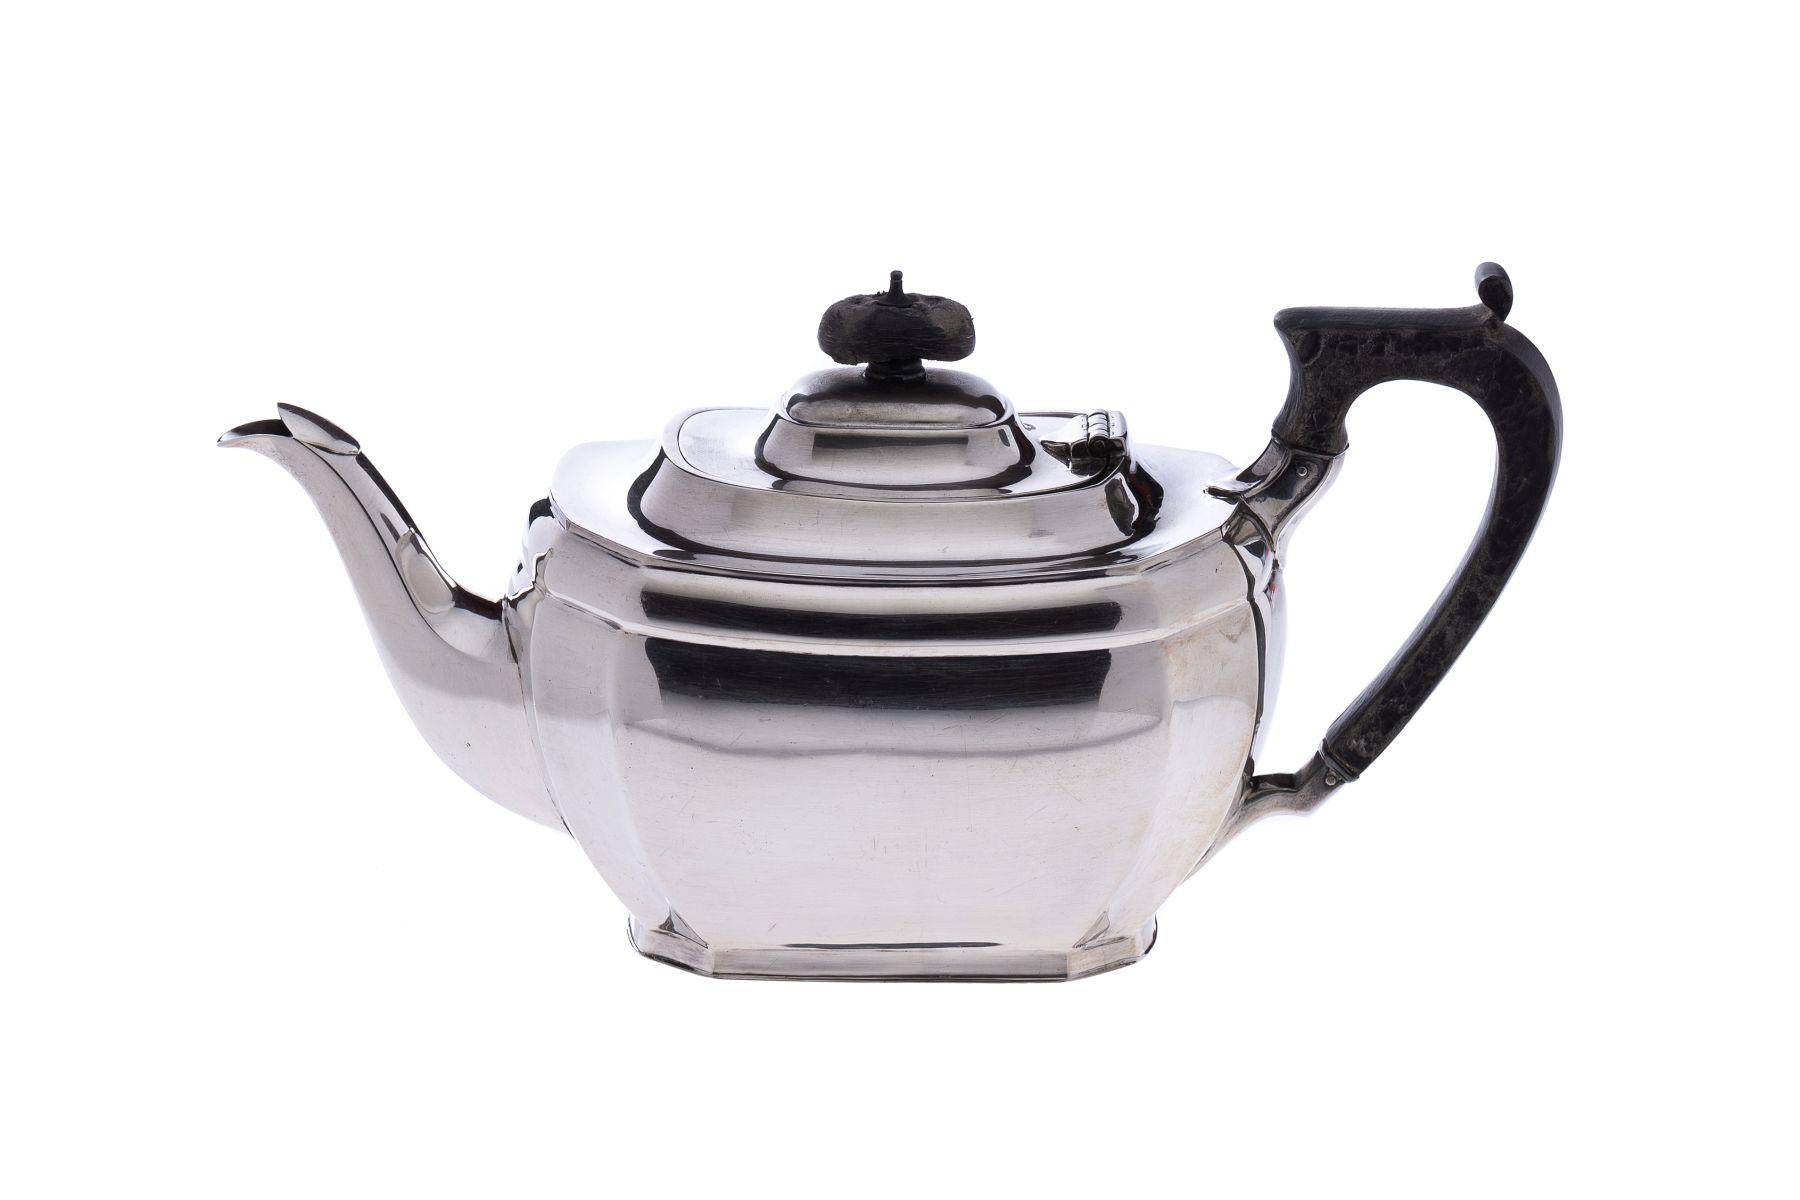 #8 English teapot | Englische Teekanne Image